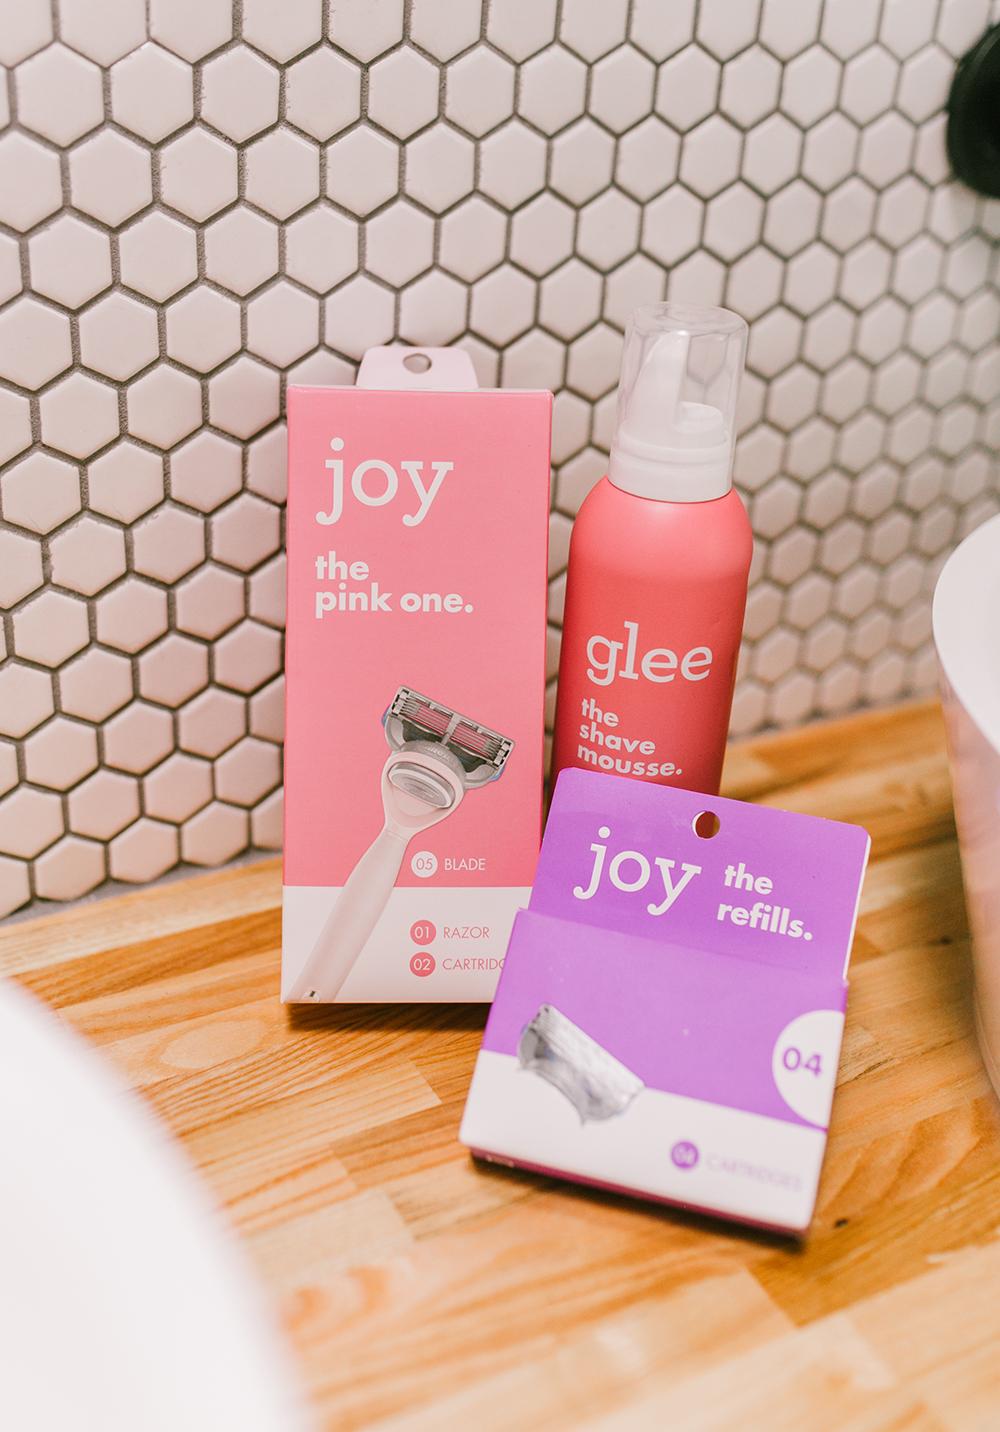 livvyland-blog-olivia-watson-joy-razor-shave-walmart-bubble-bath-2